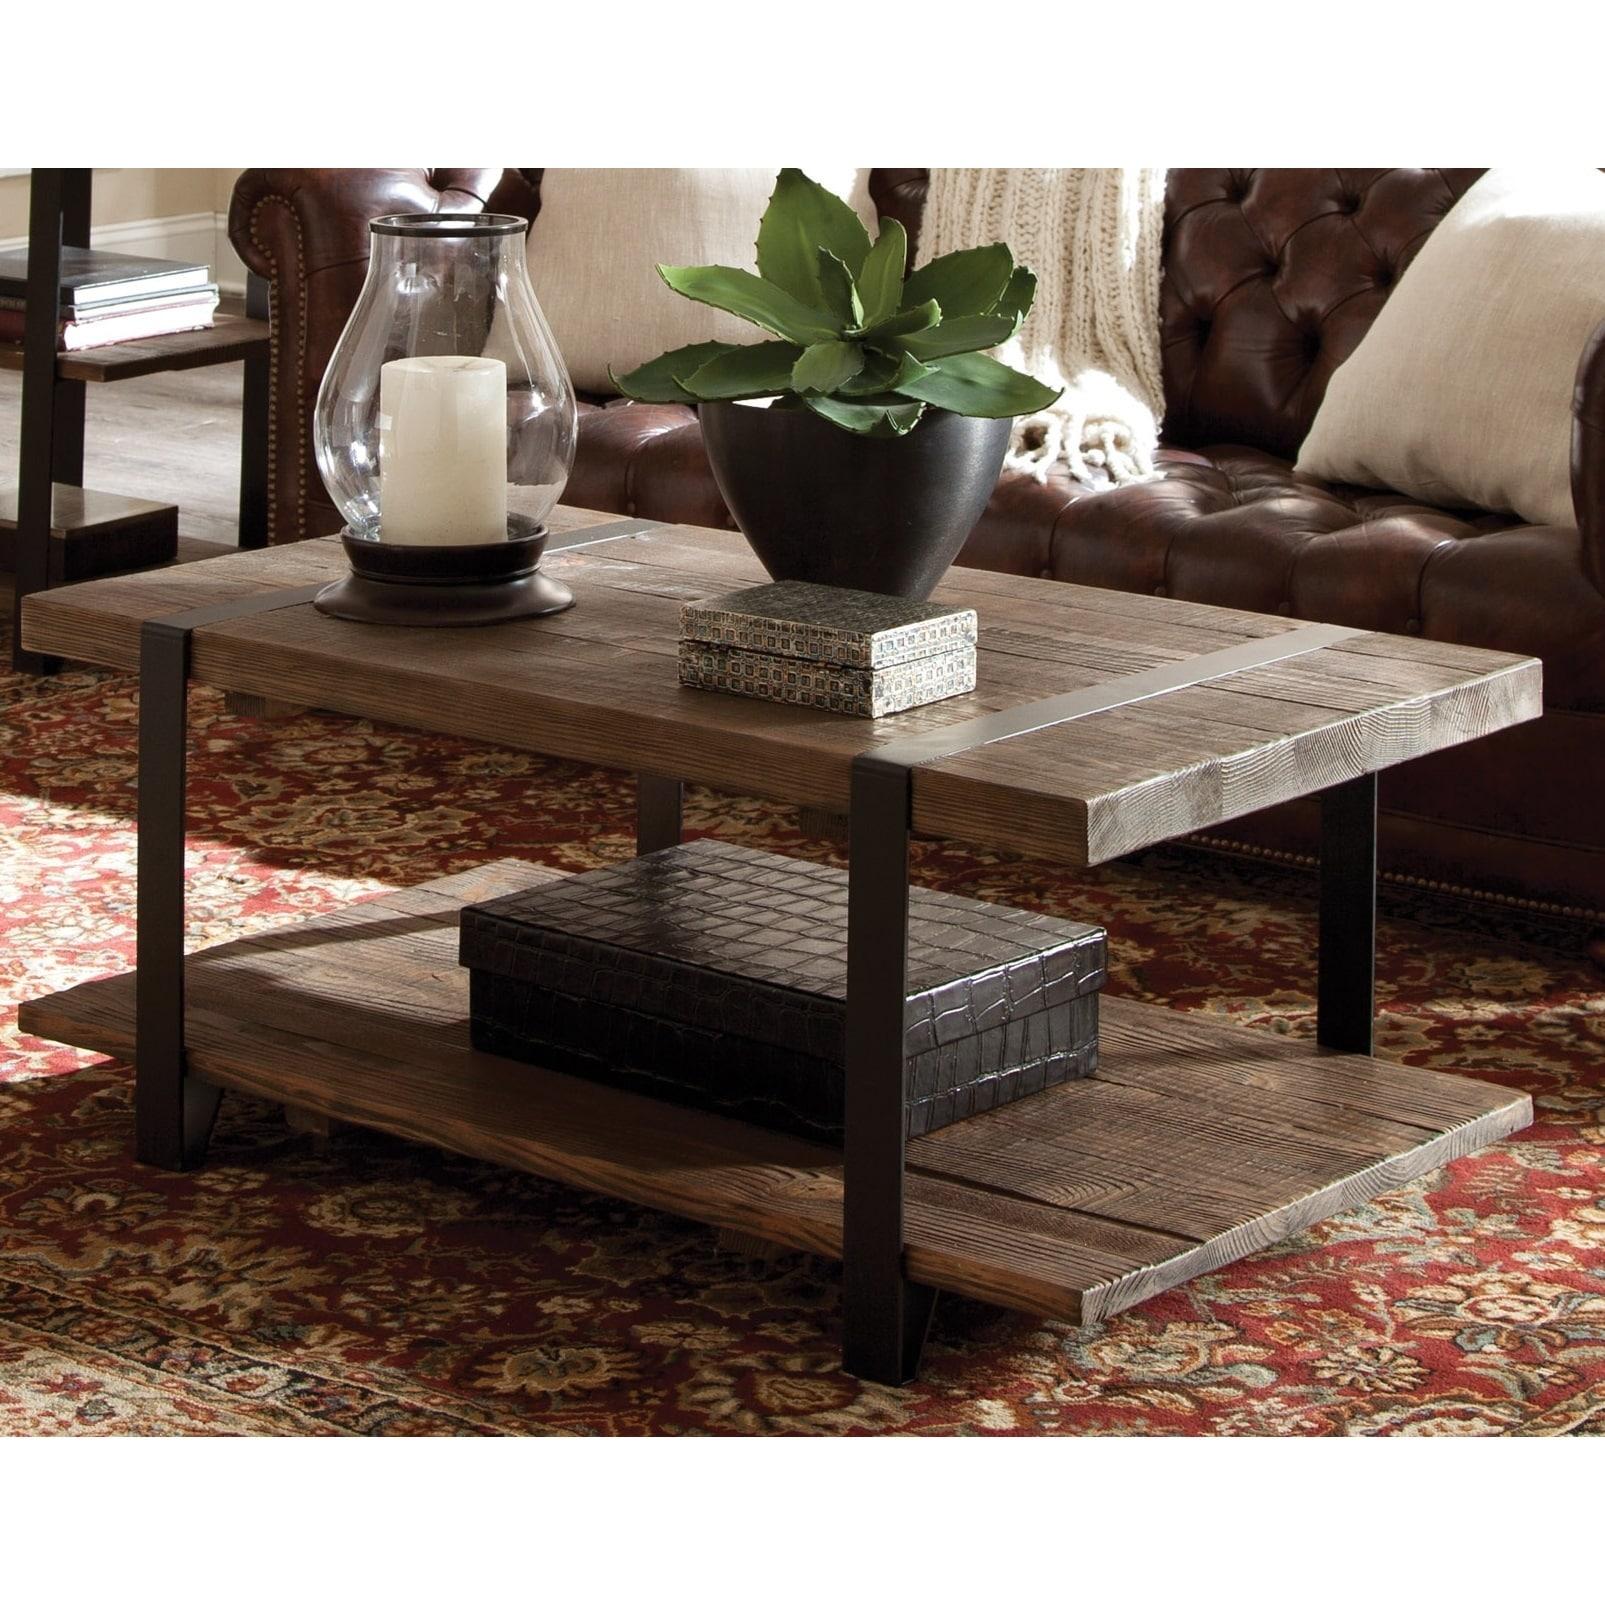 Carbon loft kenyon natural rustic coffee table